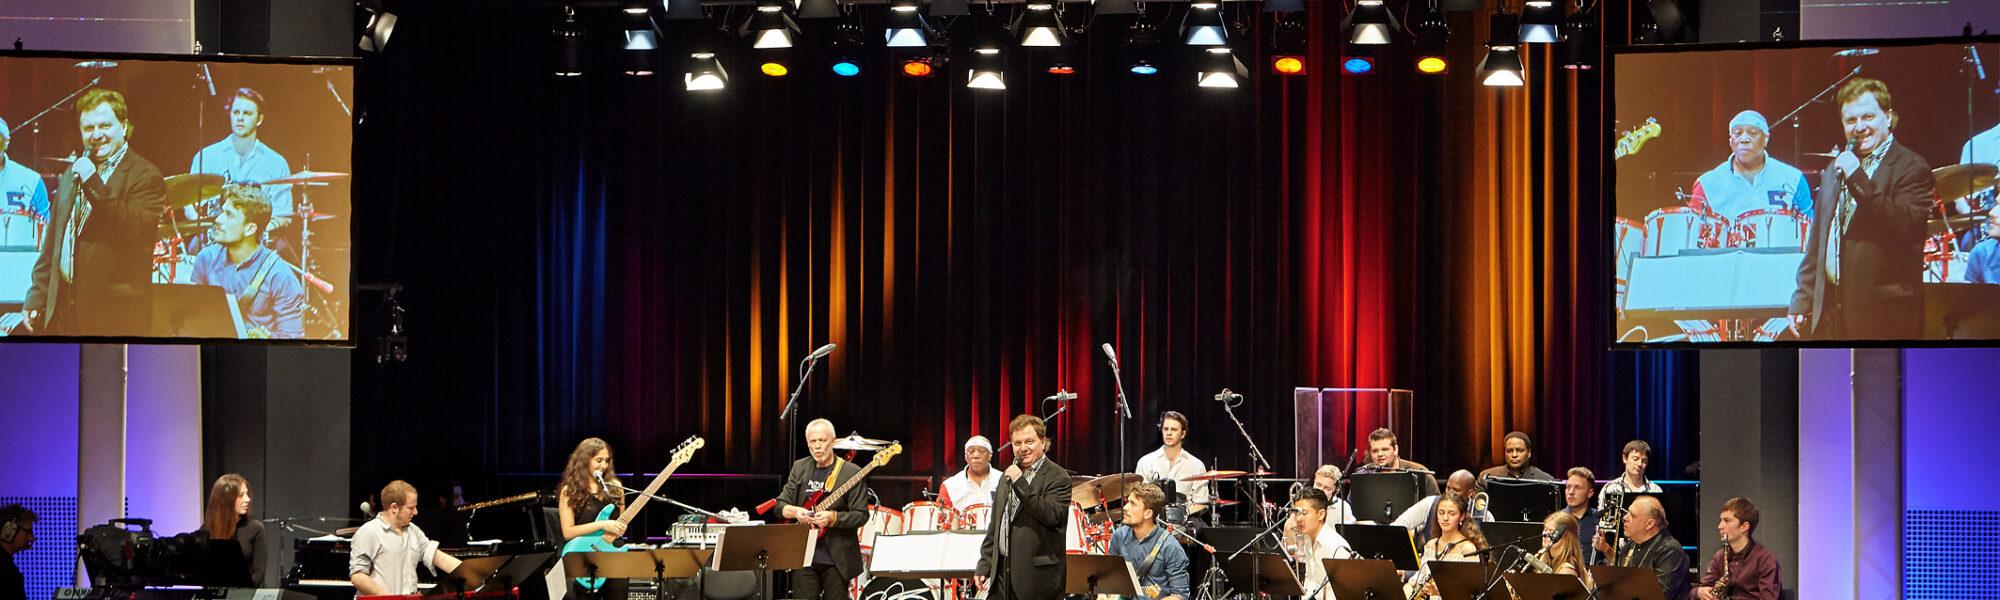 Jazzaar Festival